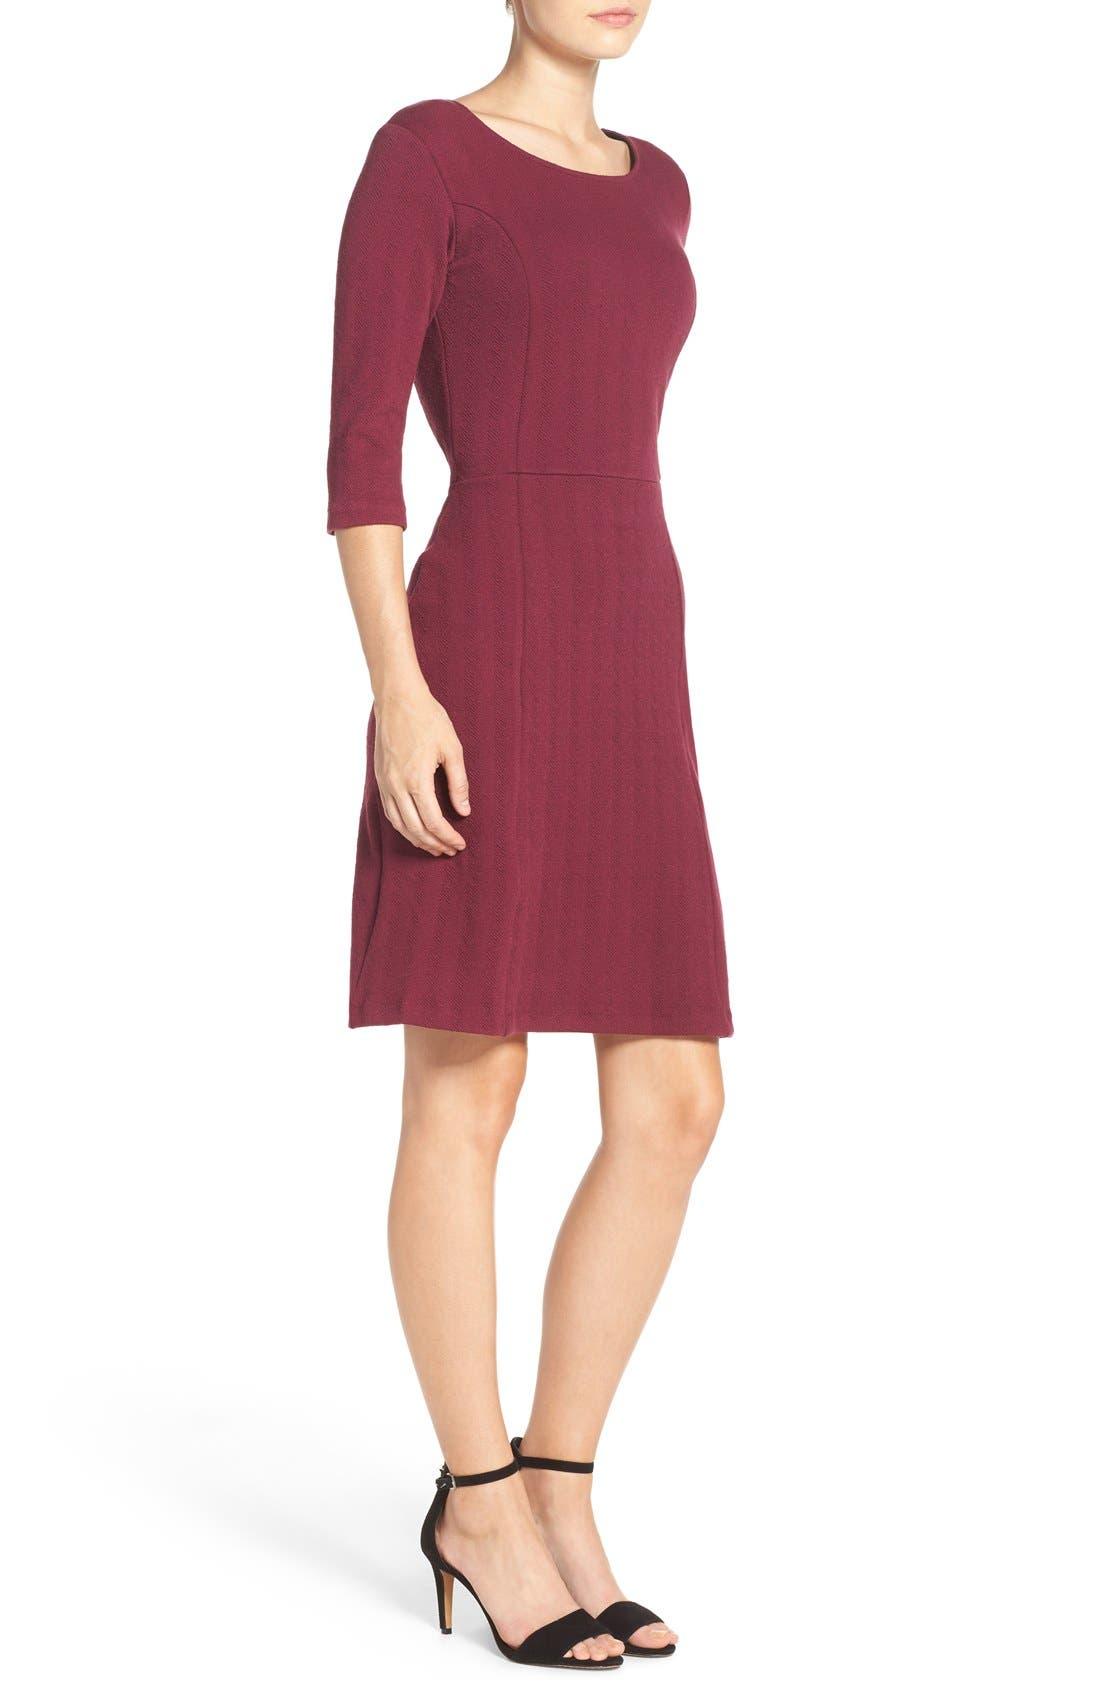 Alternate Image 3  - Leota 'Avery' Jacquard Knit Sheath Dress